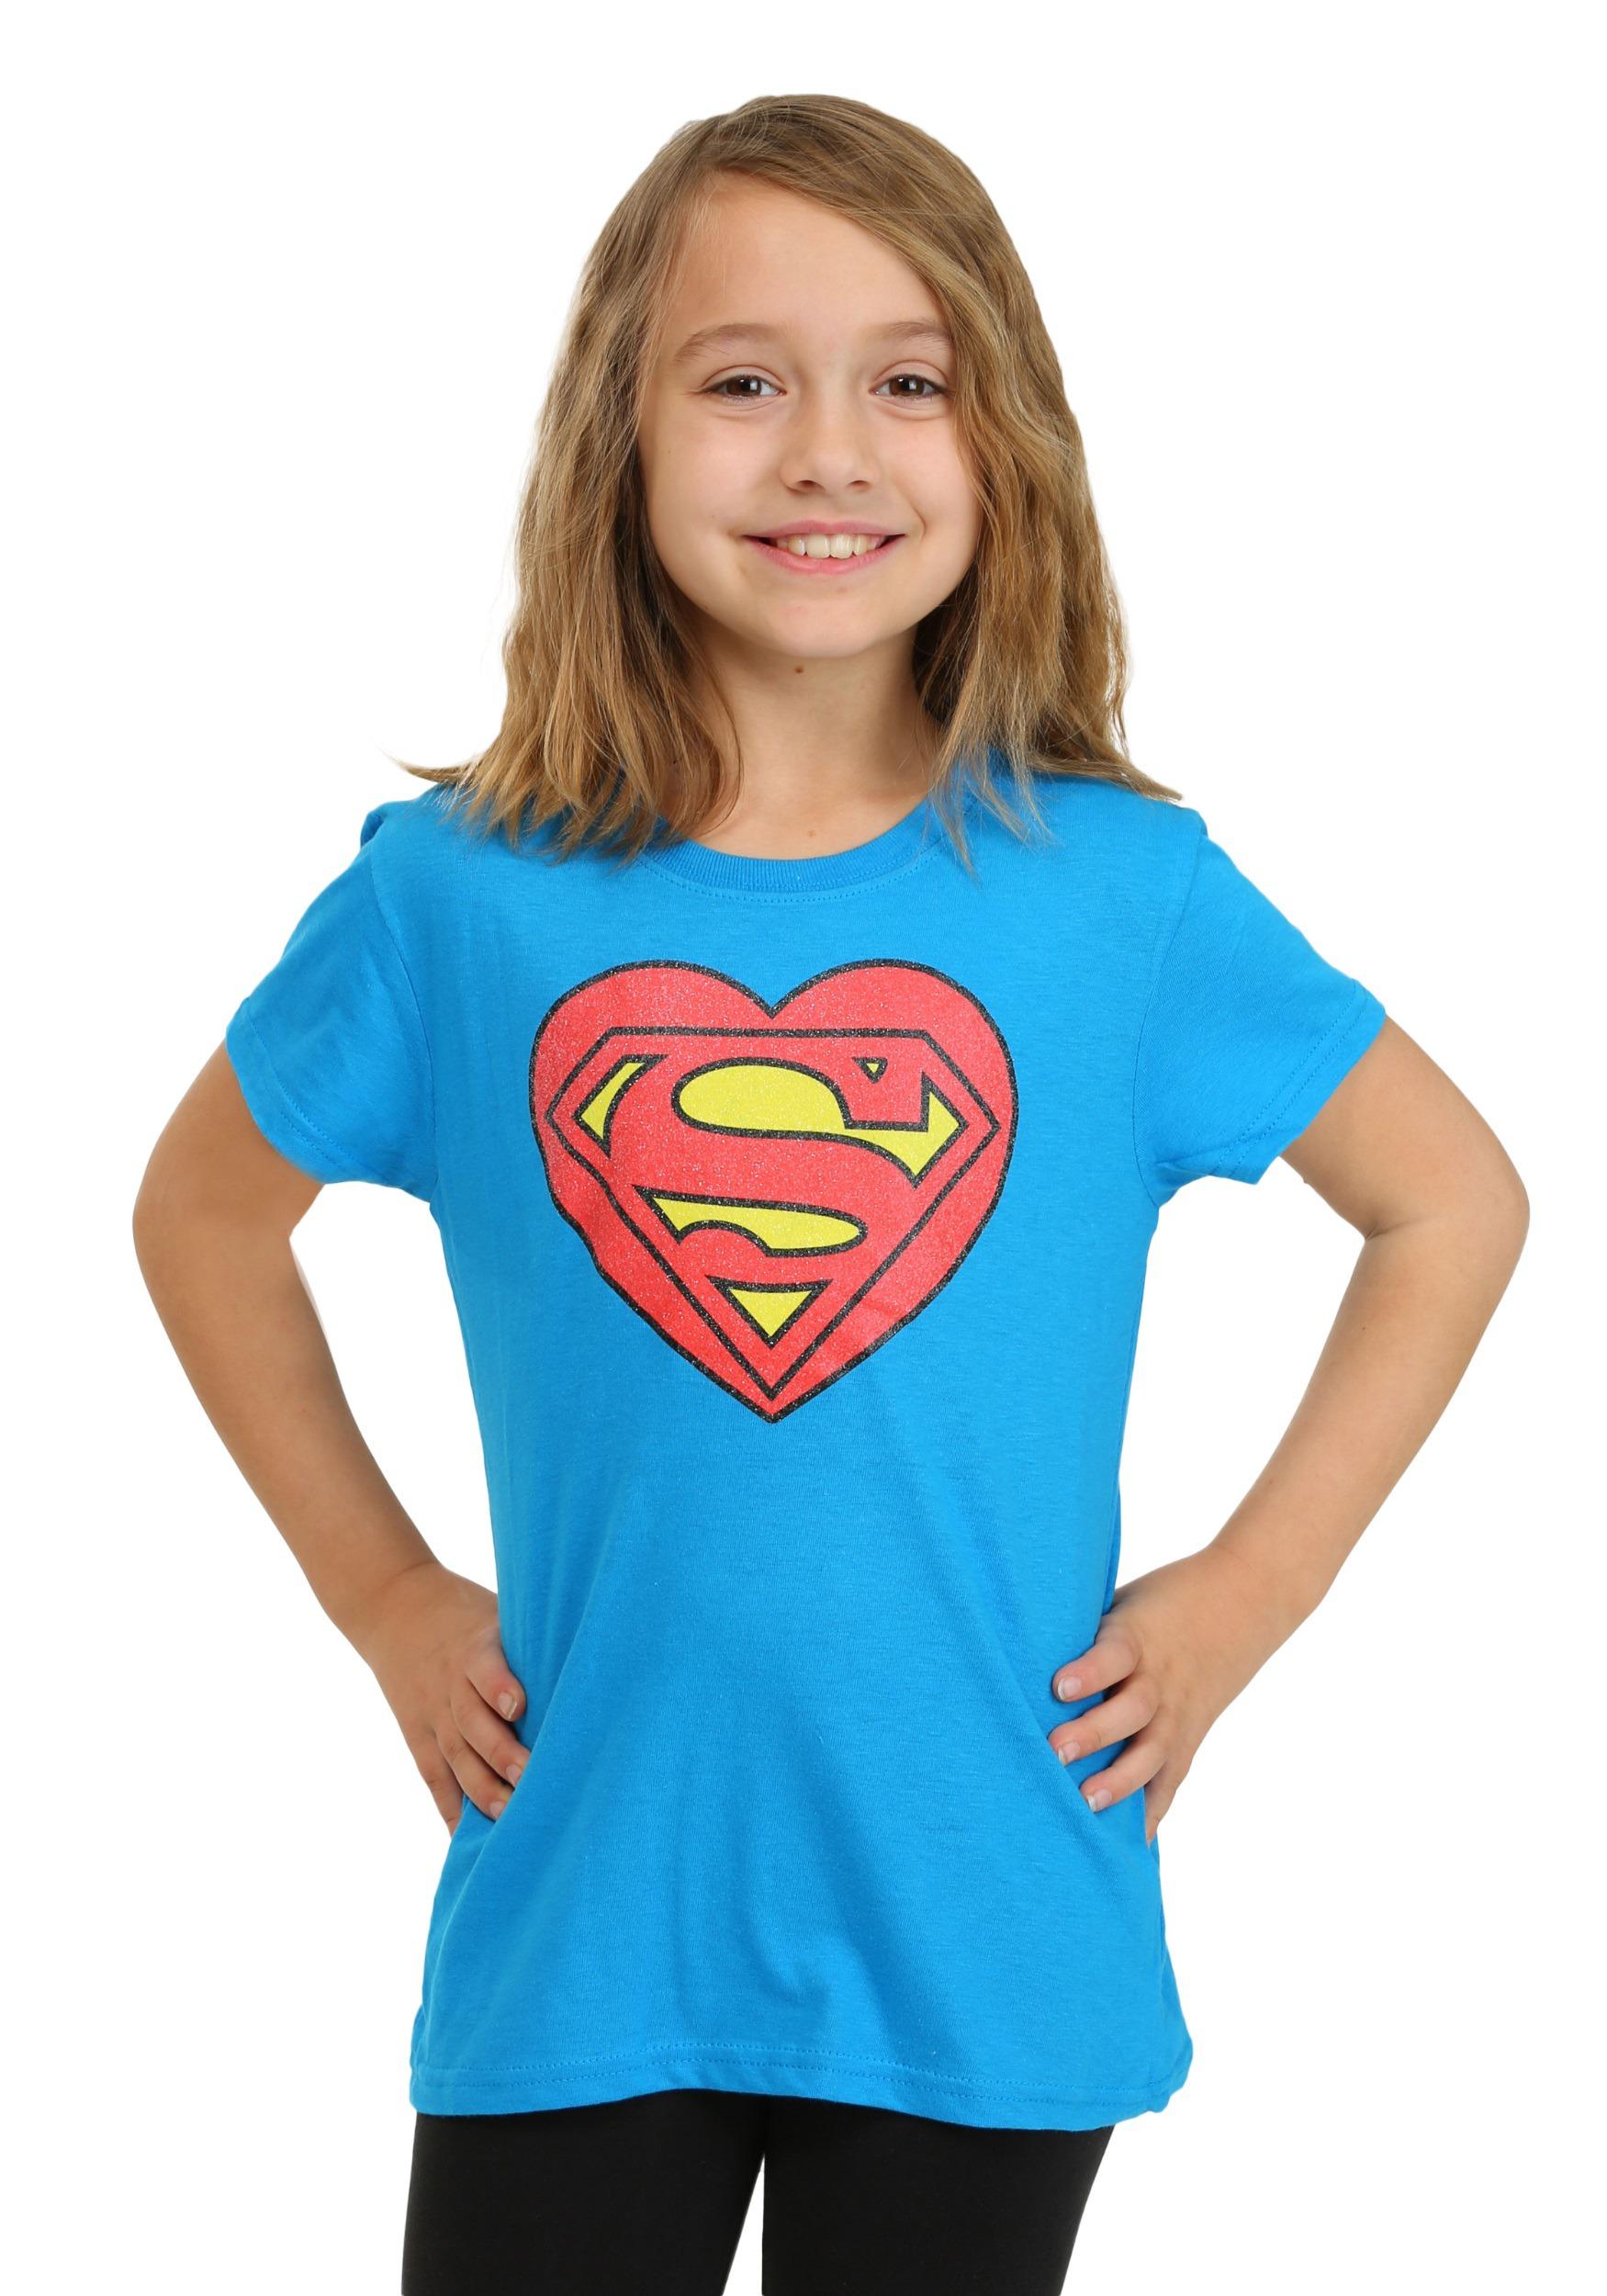 Superhero T Shirt Women